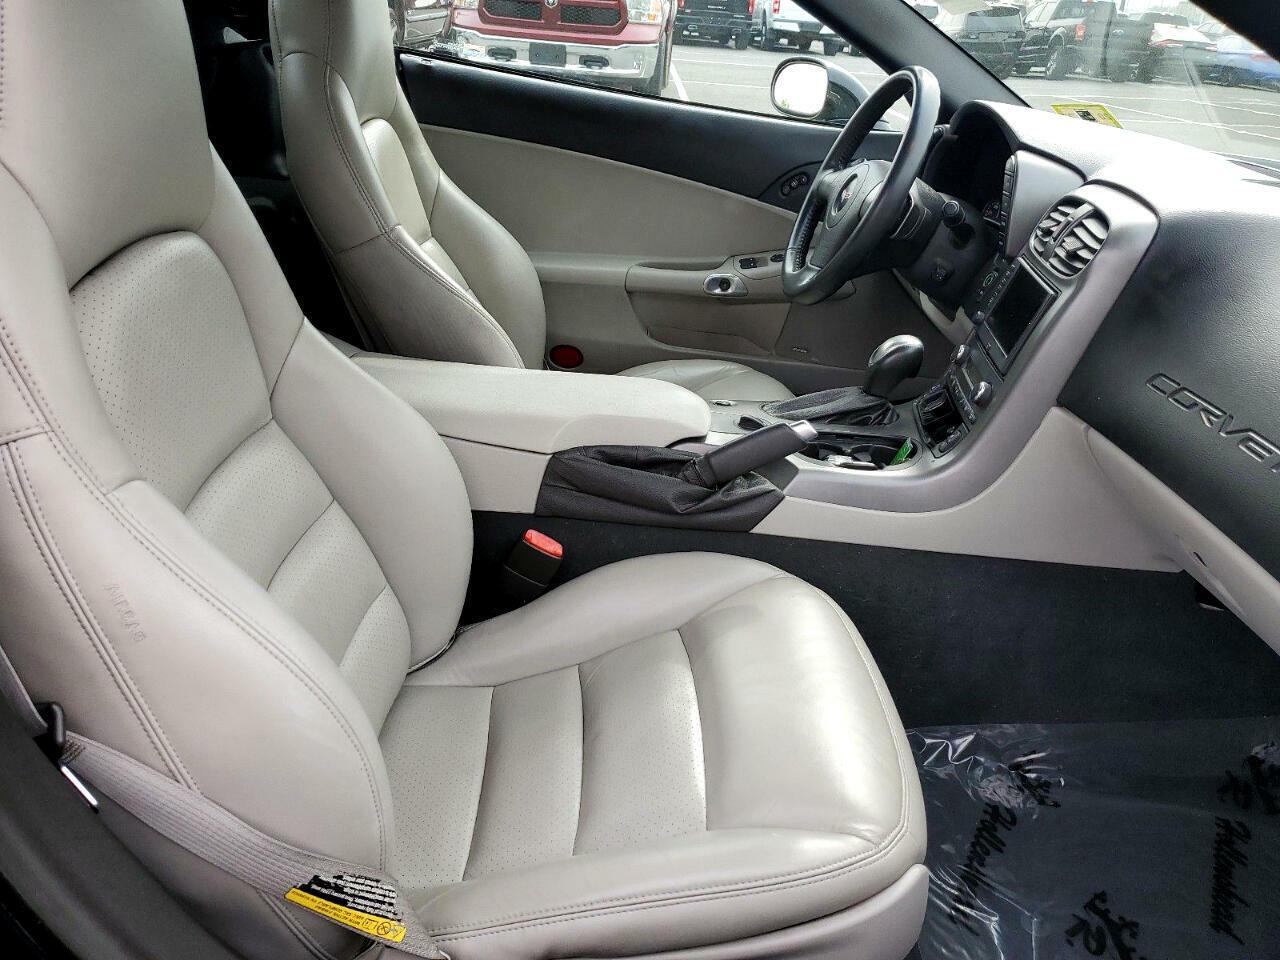 2006 Black Chevrolet Corvette Convertible  | C6 Corvette Photo 8